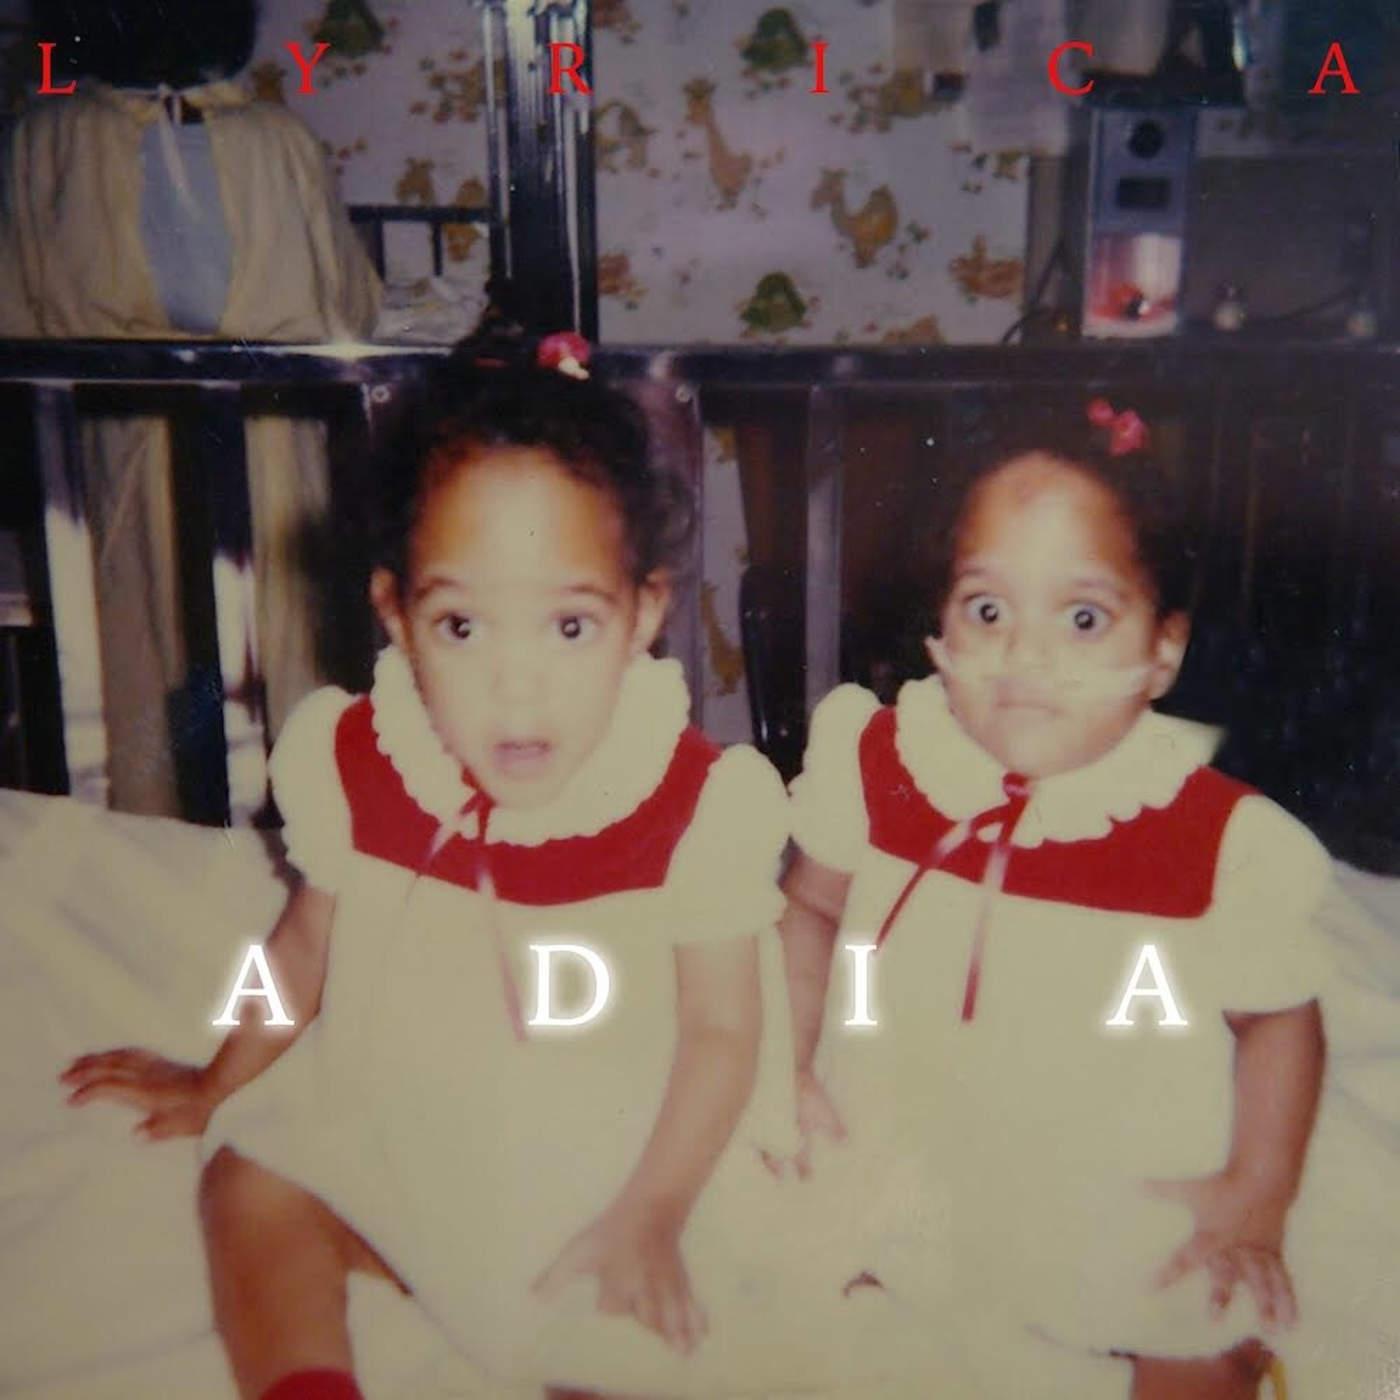 Lyrica Anderson - Adia